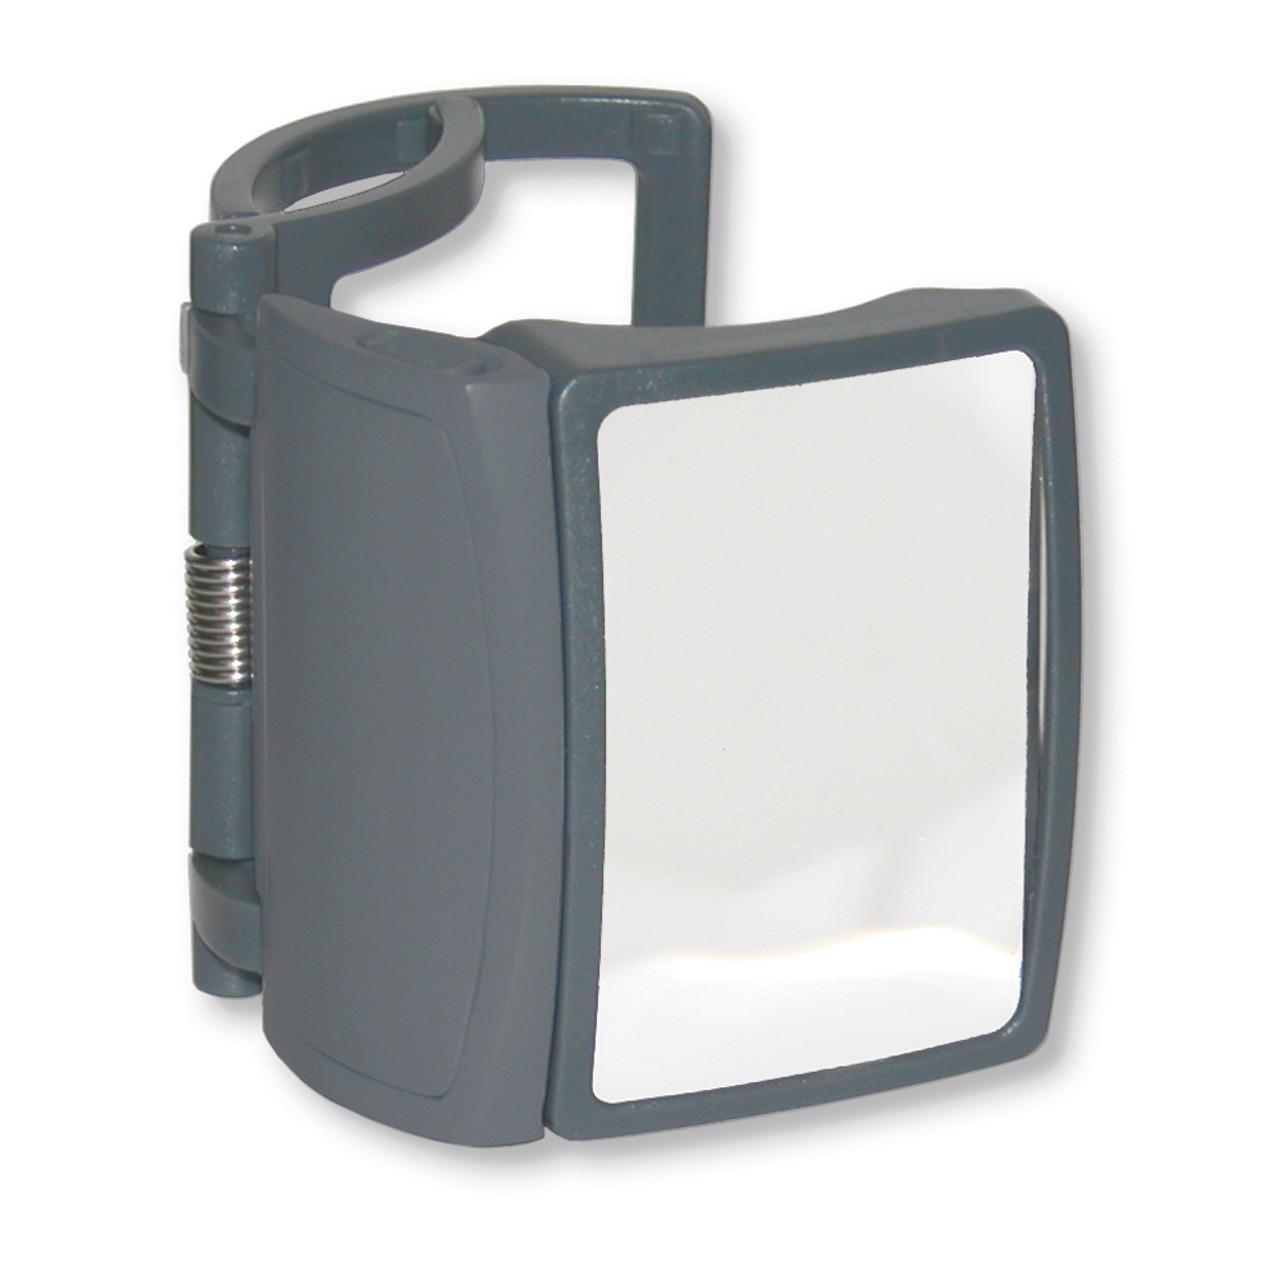 MagRX Illuminated Medicine Bottle Magnifier